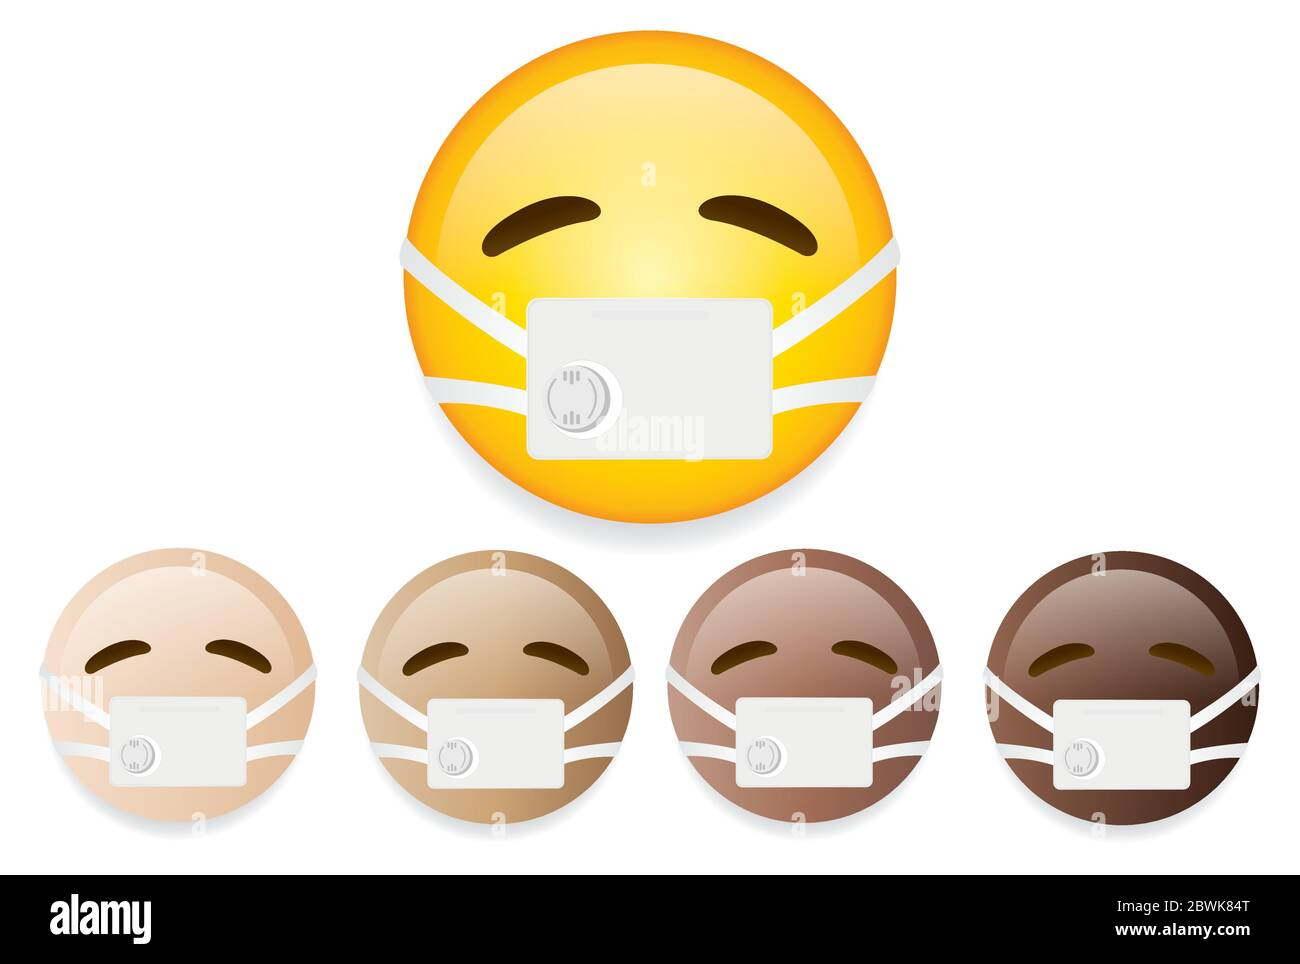 Emoticones De Haute Qualite Sur Fond Blanc Emoticone Avec Masque Medical Mask Illustration Du Vecteur Emoji Emoticones Differentes Tonalites De Peau Emoticones De Couleur Image Vectorielle Stock Alamy